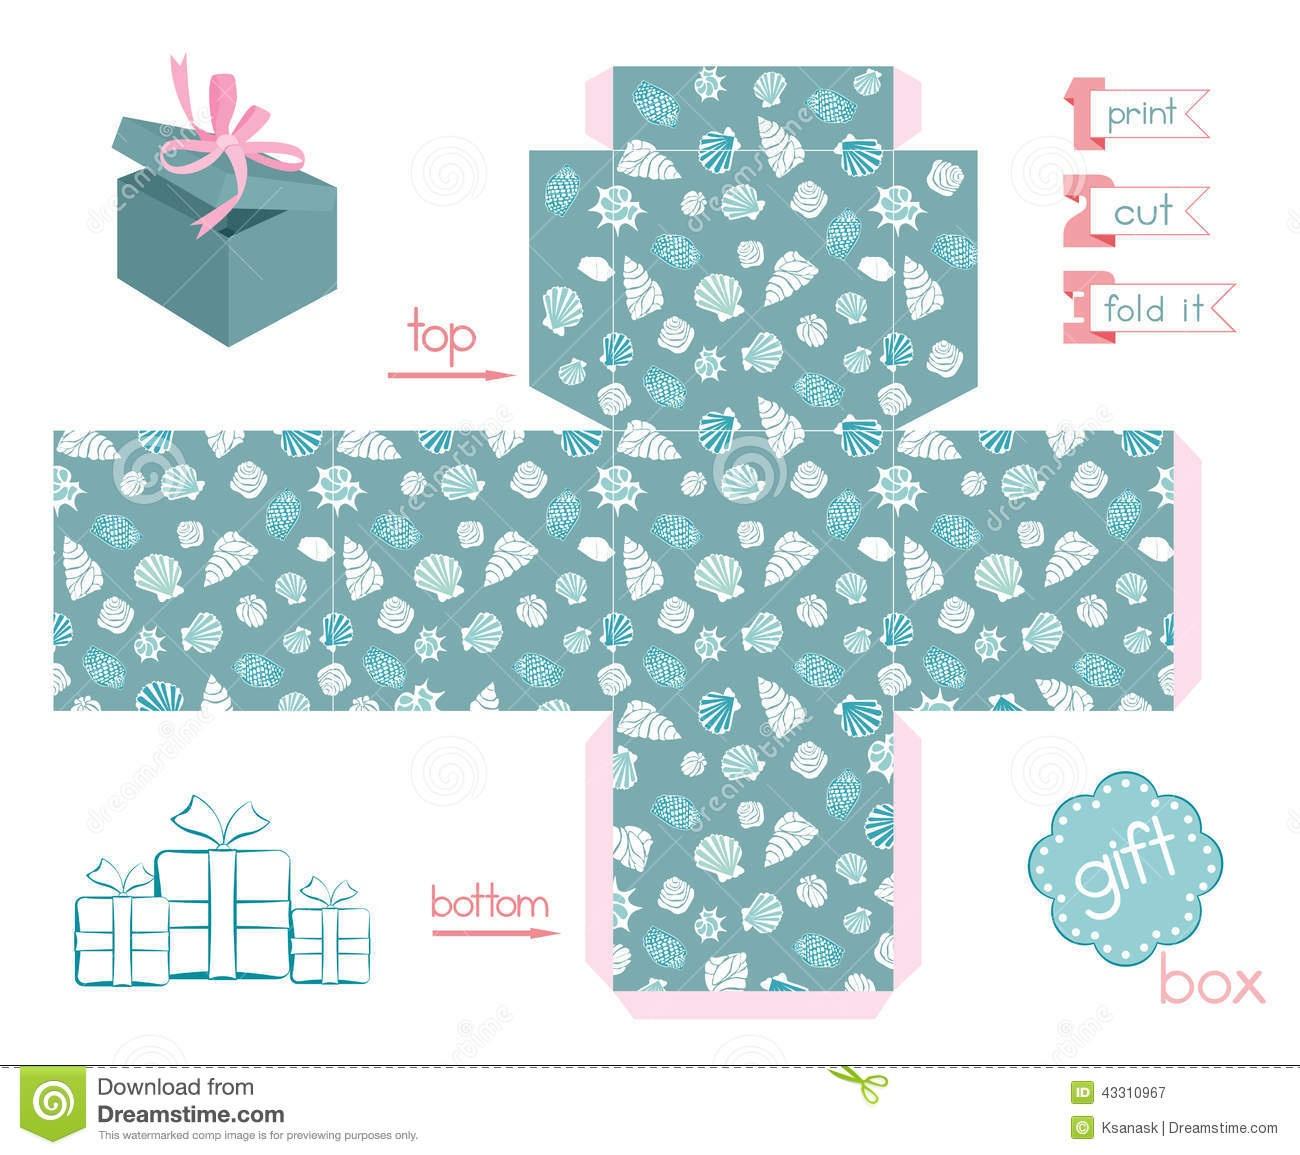 Printable Gift Box Various Shells Stock Vector - Illustration Of - Free Printable Gift Boxes